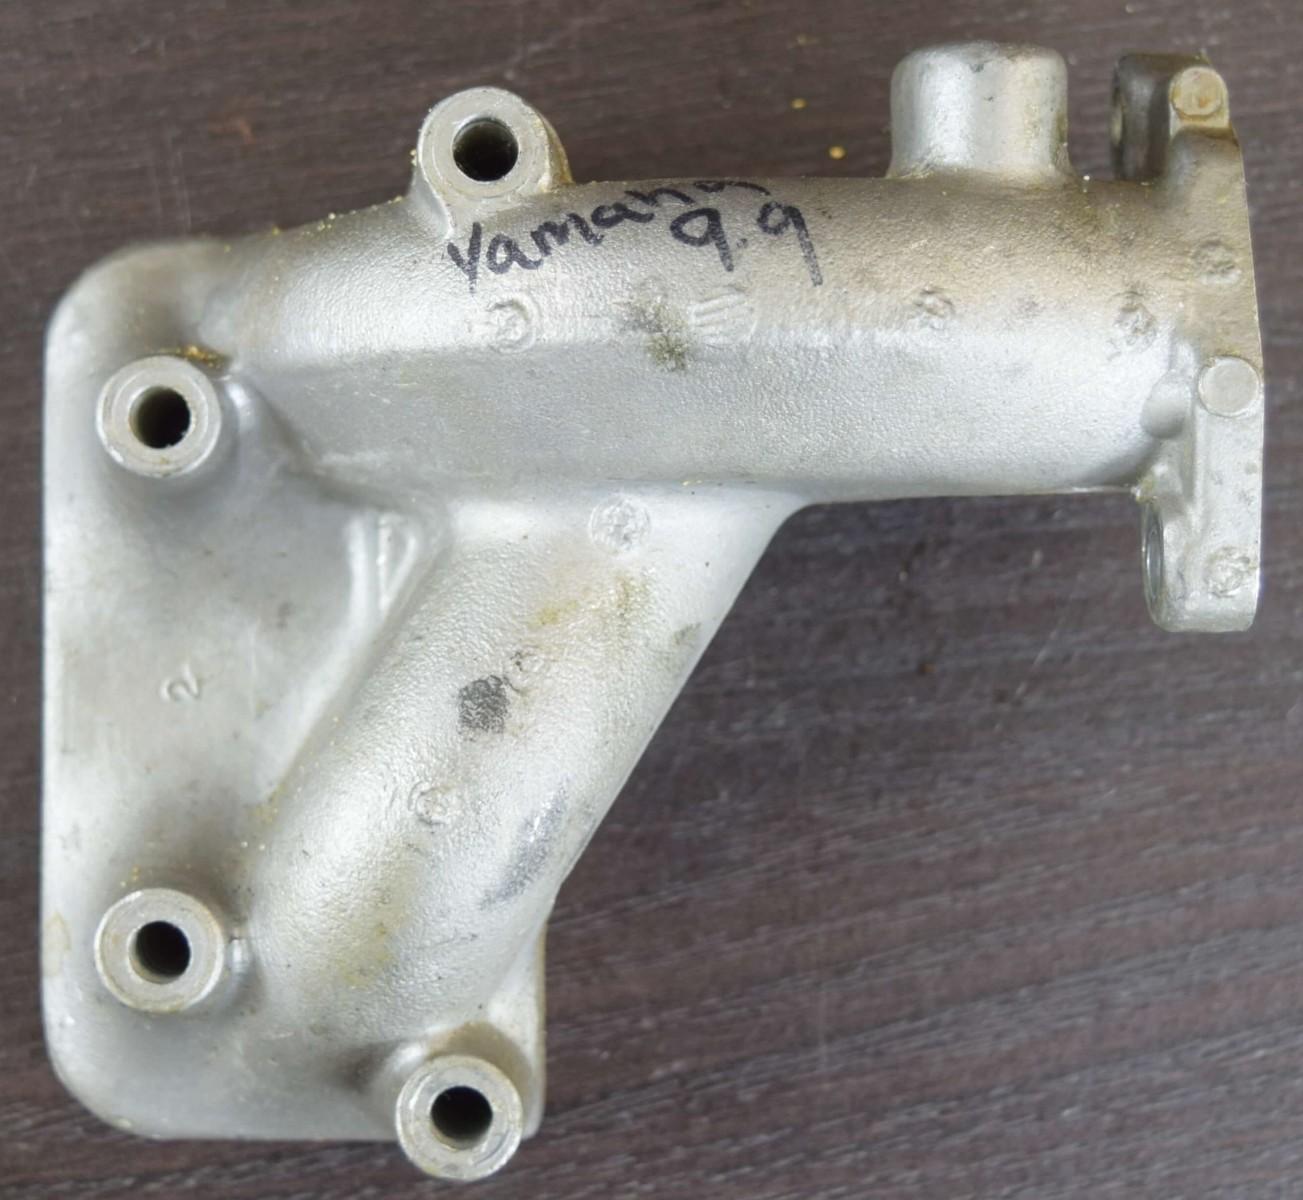 1992-2006 & UP Yamaha Manifold 6G8-13641-01-94 6G8-13641-02-94 9.9 HP 4 stroke